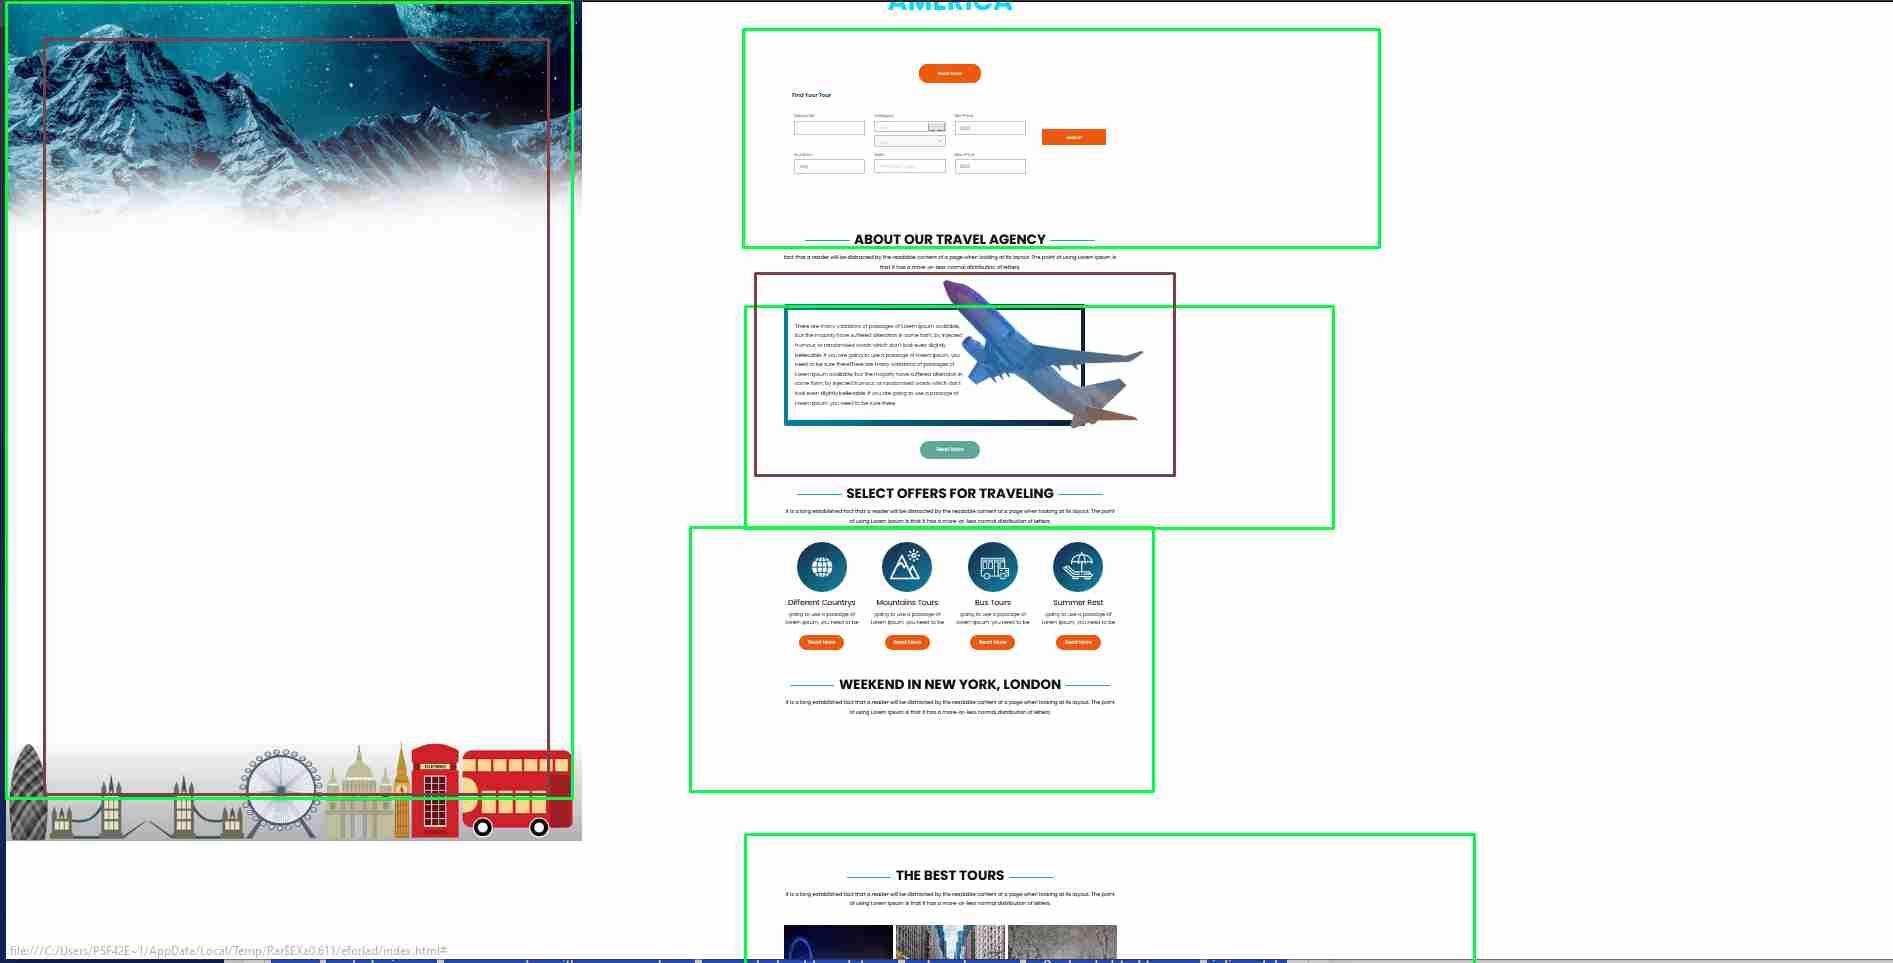 Complete Responsive Website Using HTML, CSS & JAVASCRIPT